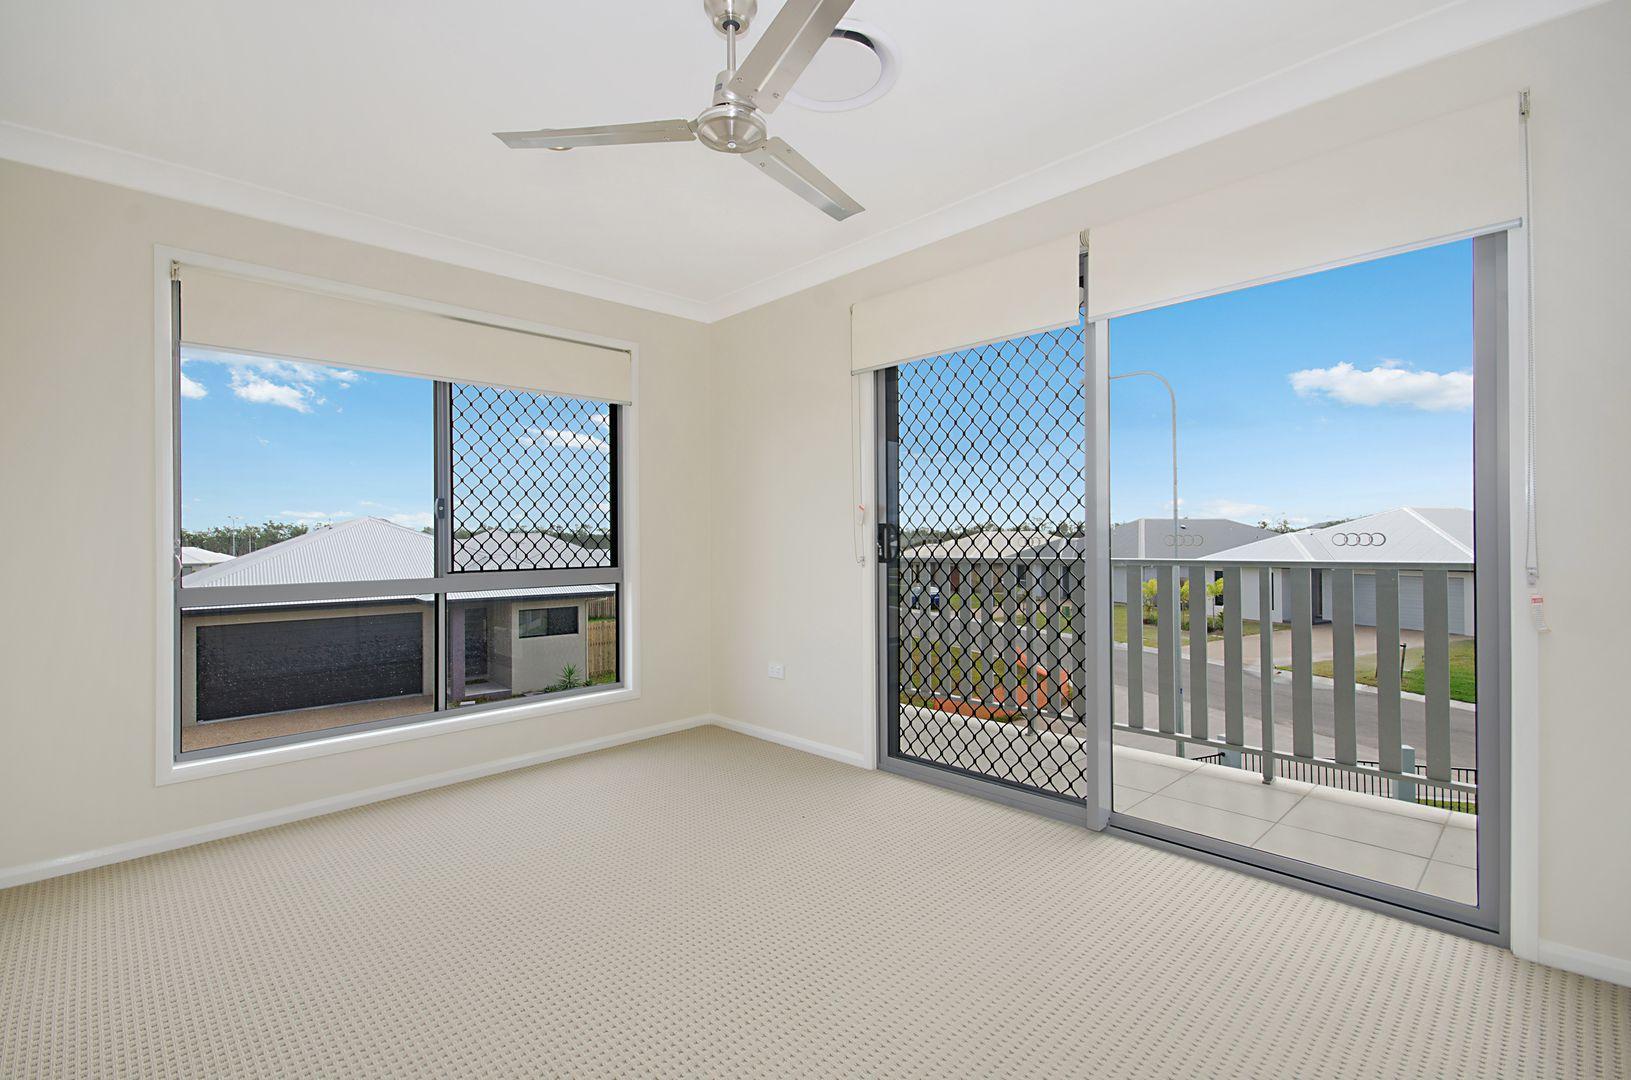 2/10 Brooke Lane, Burdell QLD 4818, Image 2